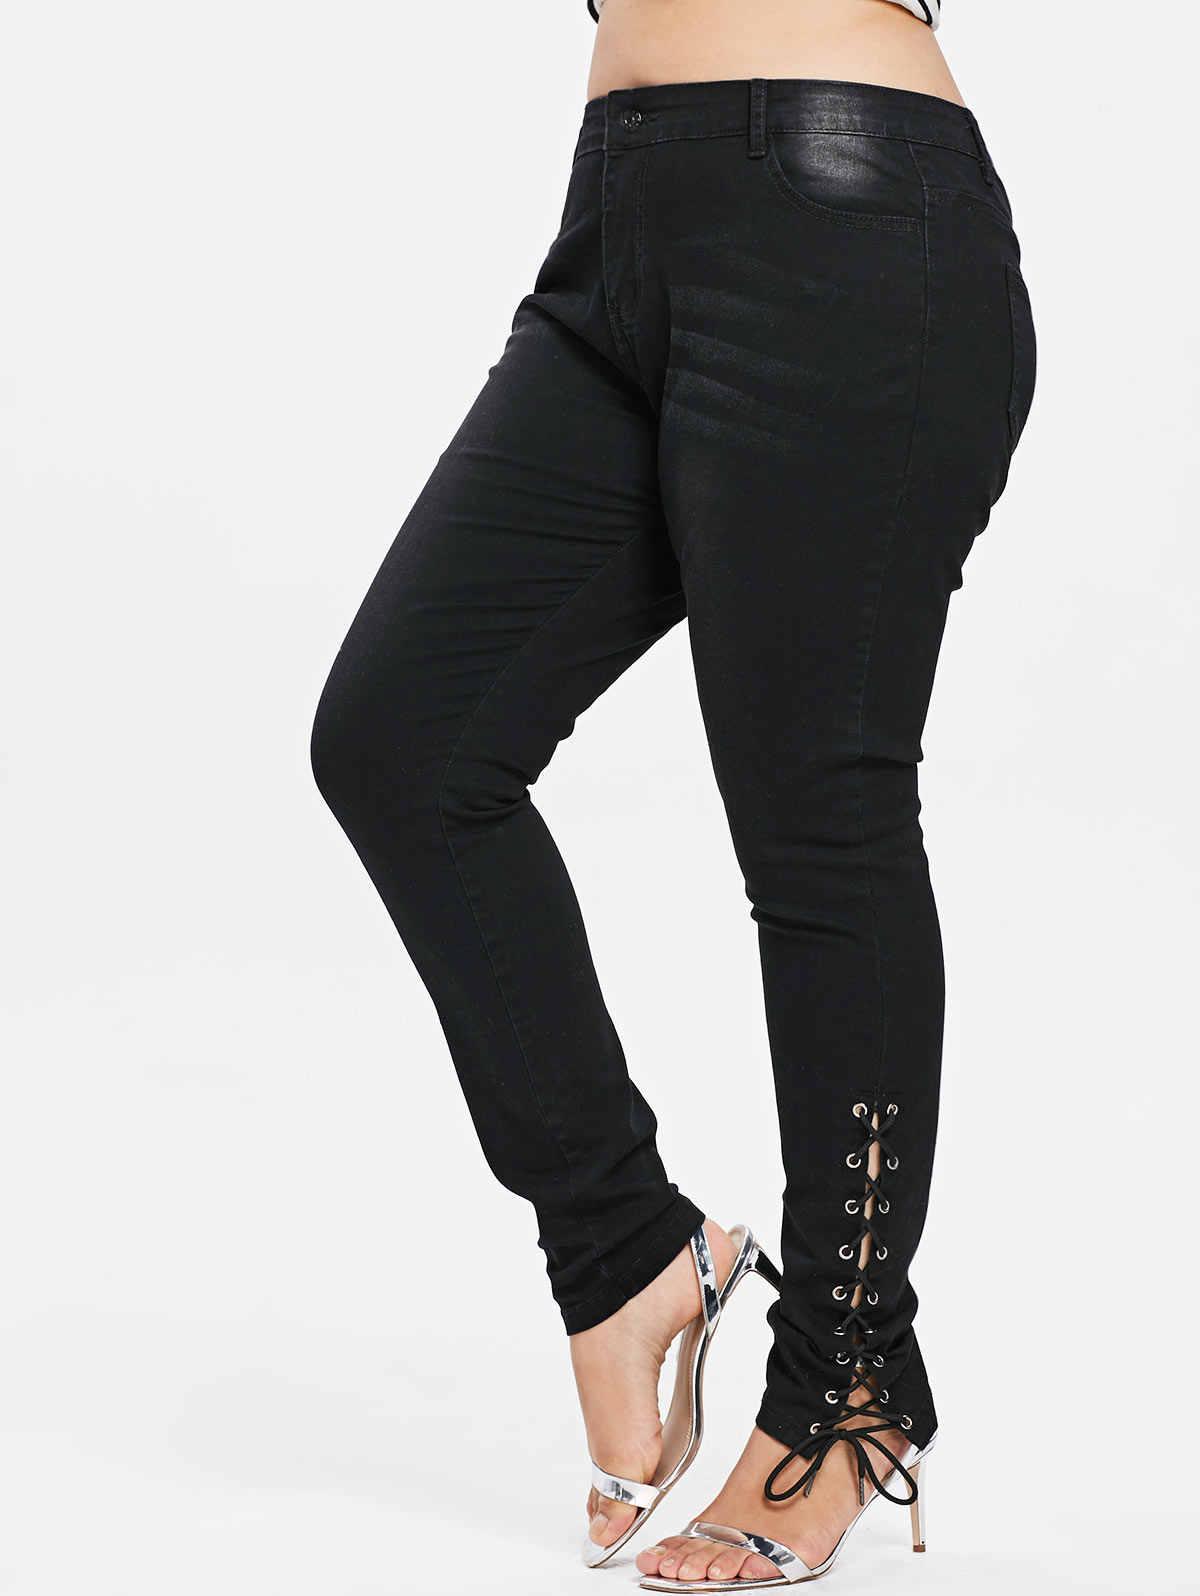 b3dd9dddbc4 Wipalo Plus Size Jeans Zipper Fly Side Lace Up Women Pants New Fashions  Skinny High Waist